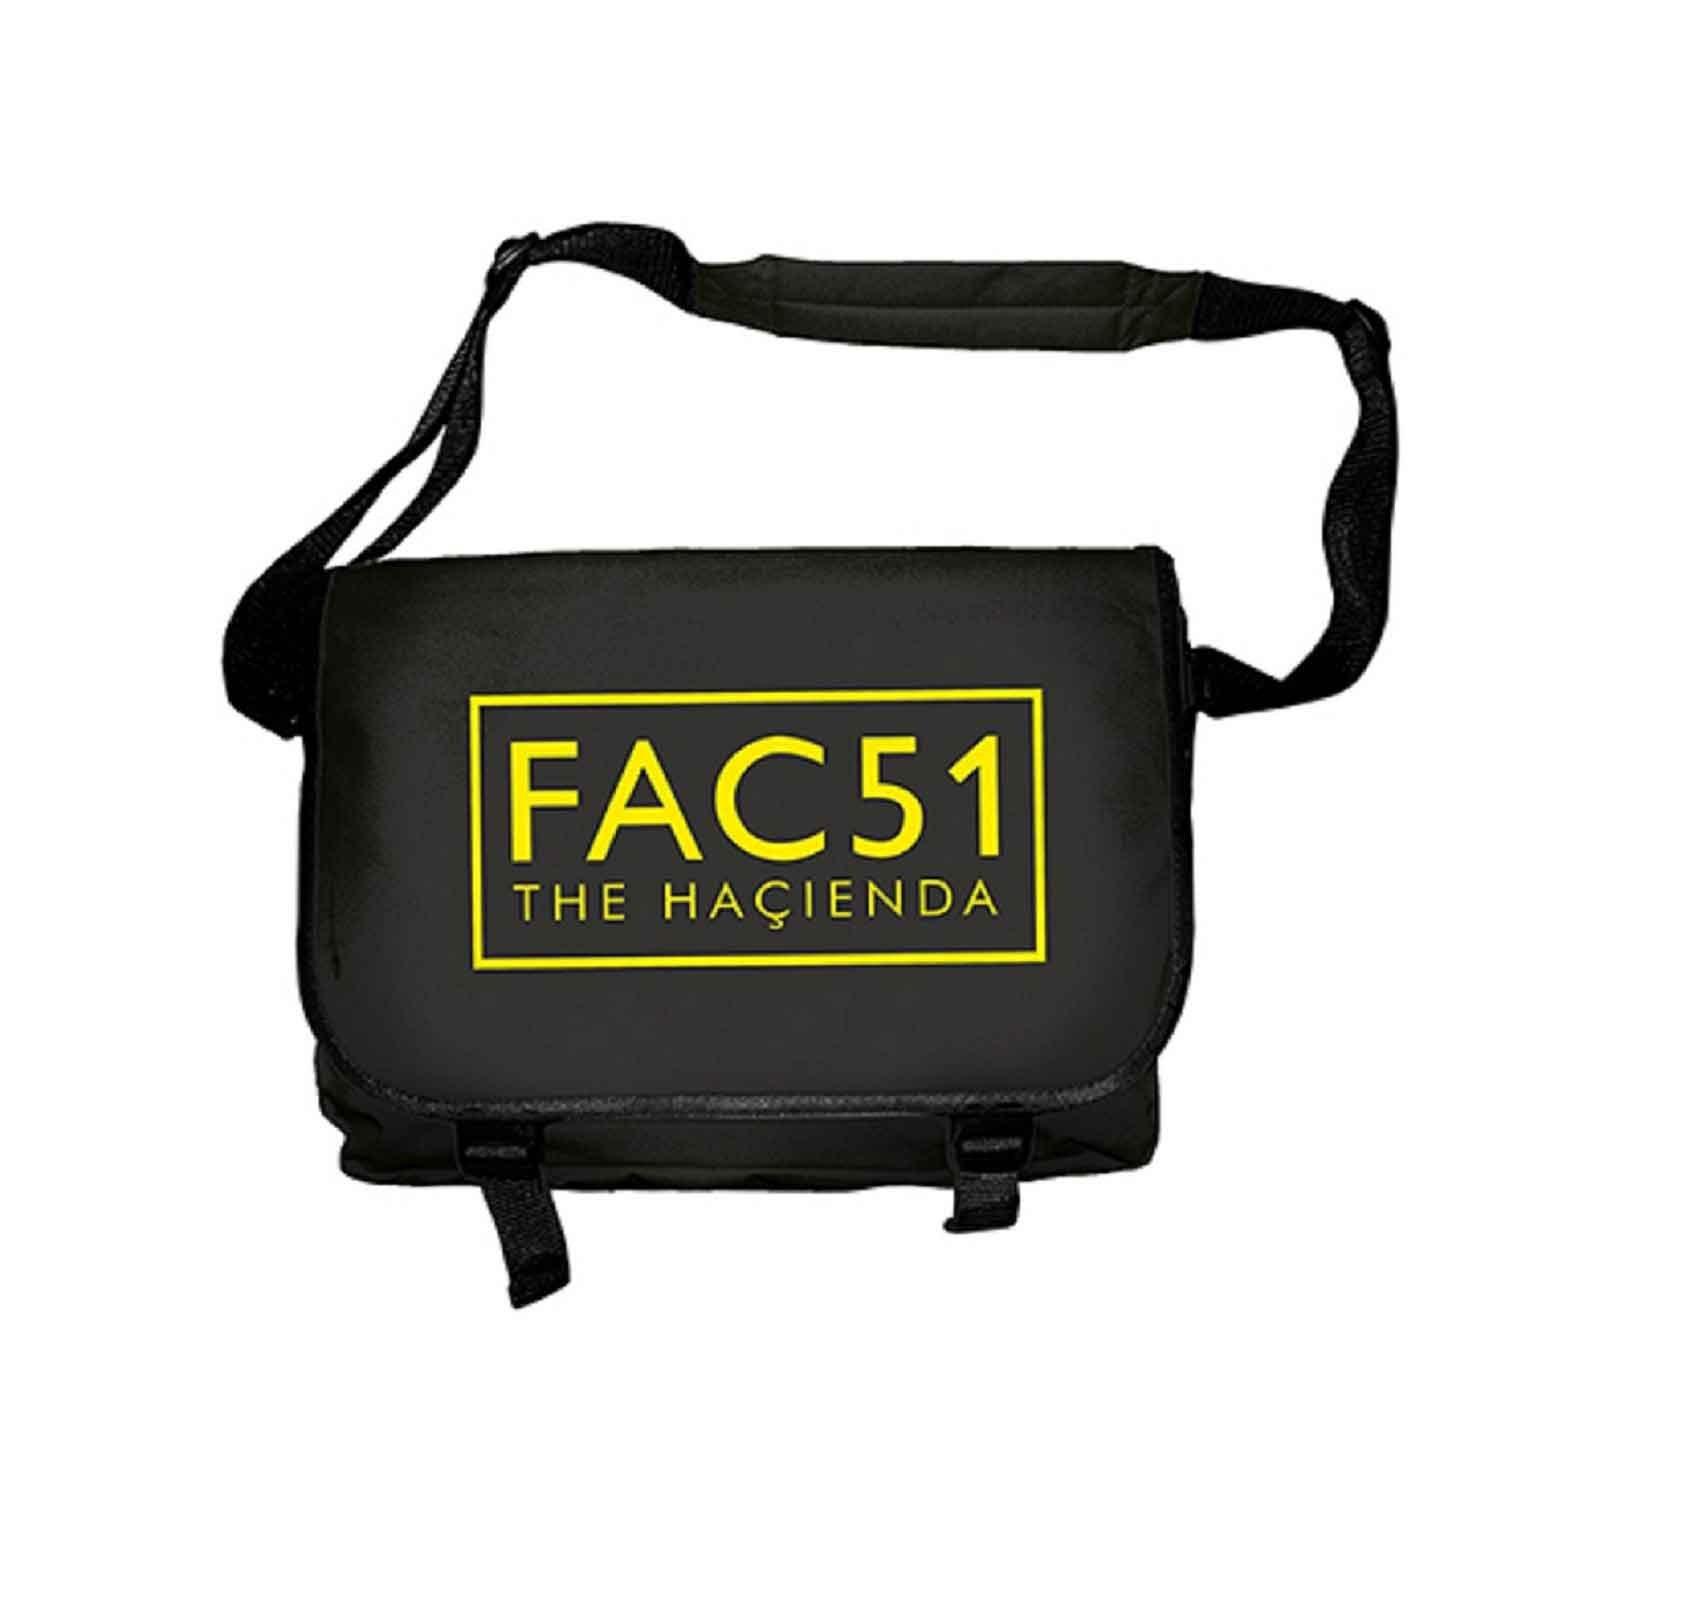 The Hacienda Fac 51 Logo Official Black Messenger Bag